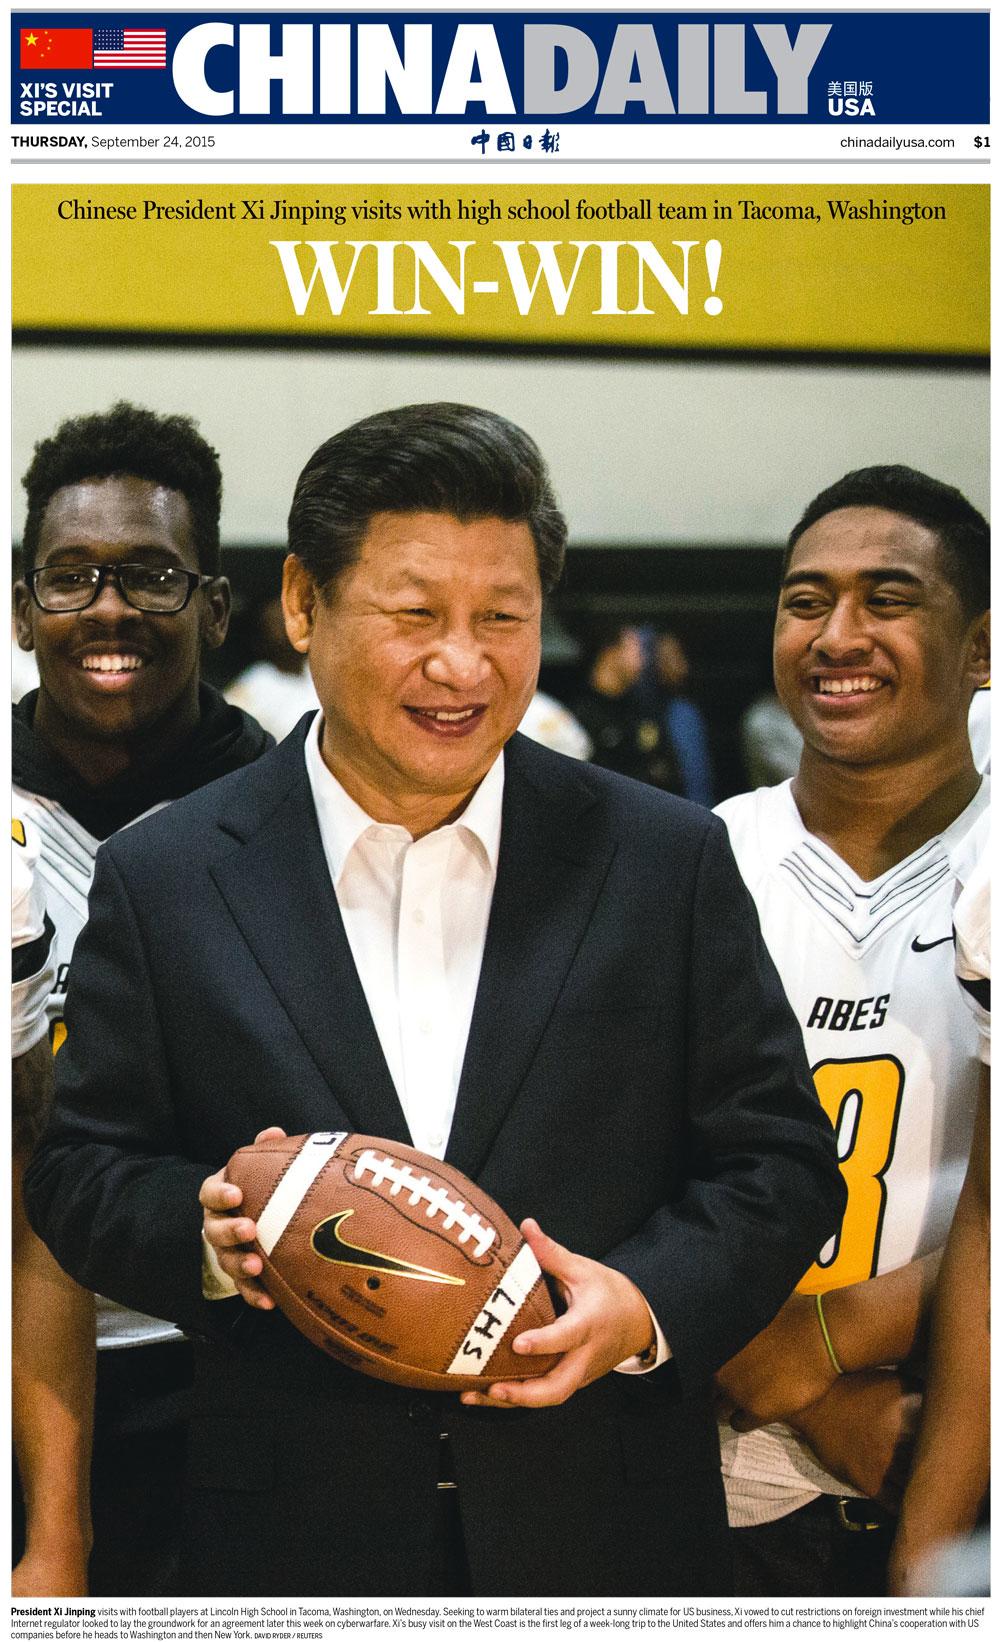 'China Daily,' U.S. edition, September 24, 2015.